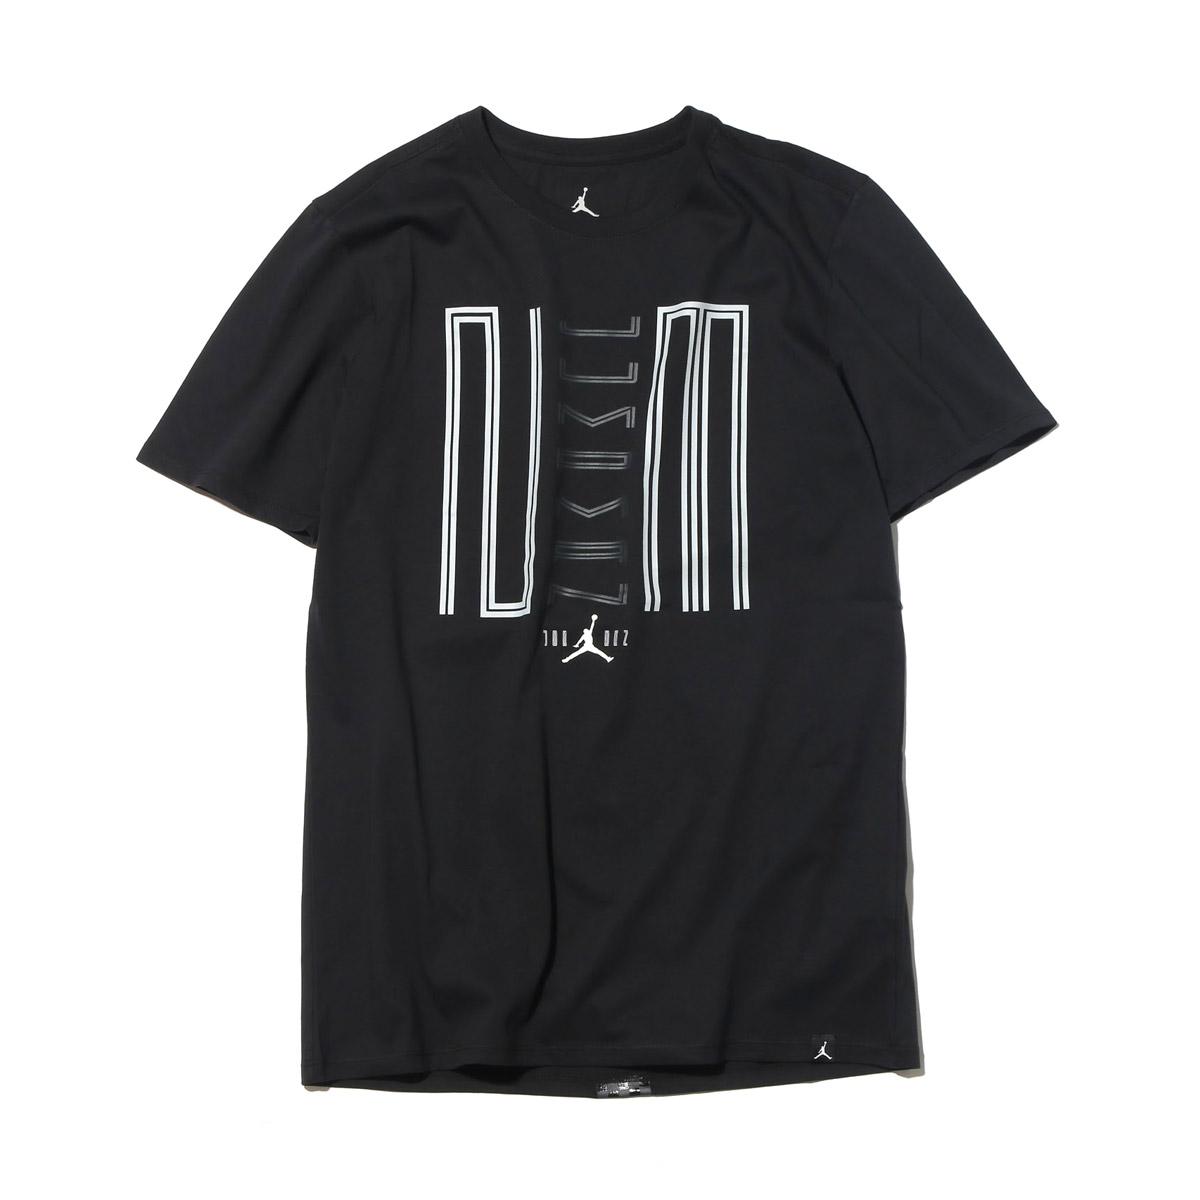 d9a52c5af3ae7e NIKE AJ 11 JUMPMAN 23 TEE (Nike Jordan AJ 11 jump man 23 S S T-shirt)  (BLACK WHITE) 17SU-I